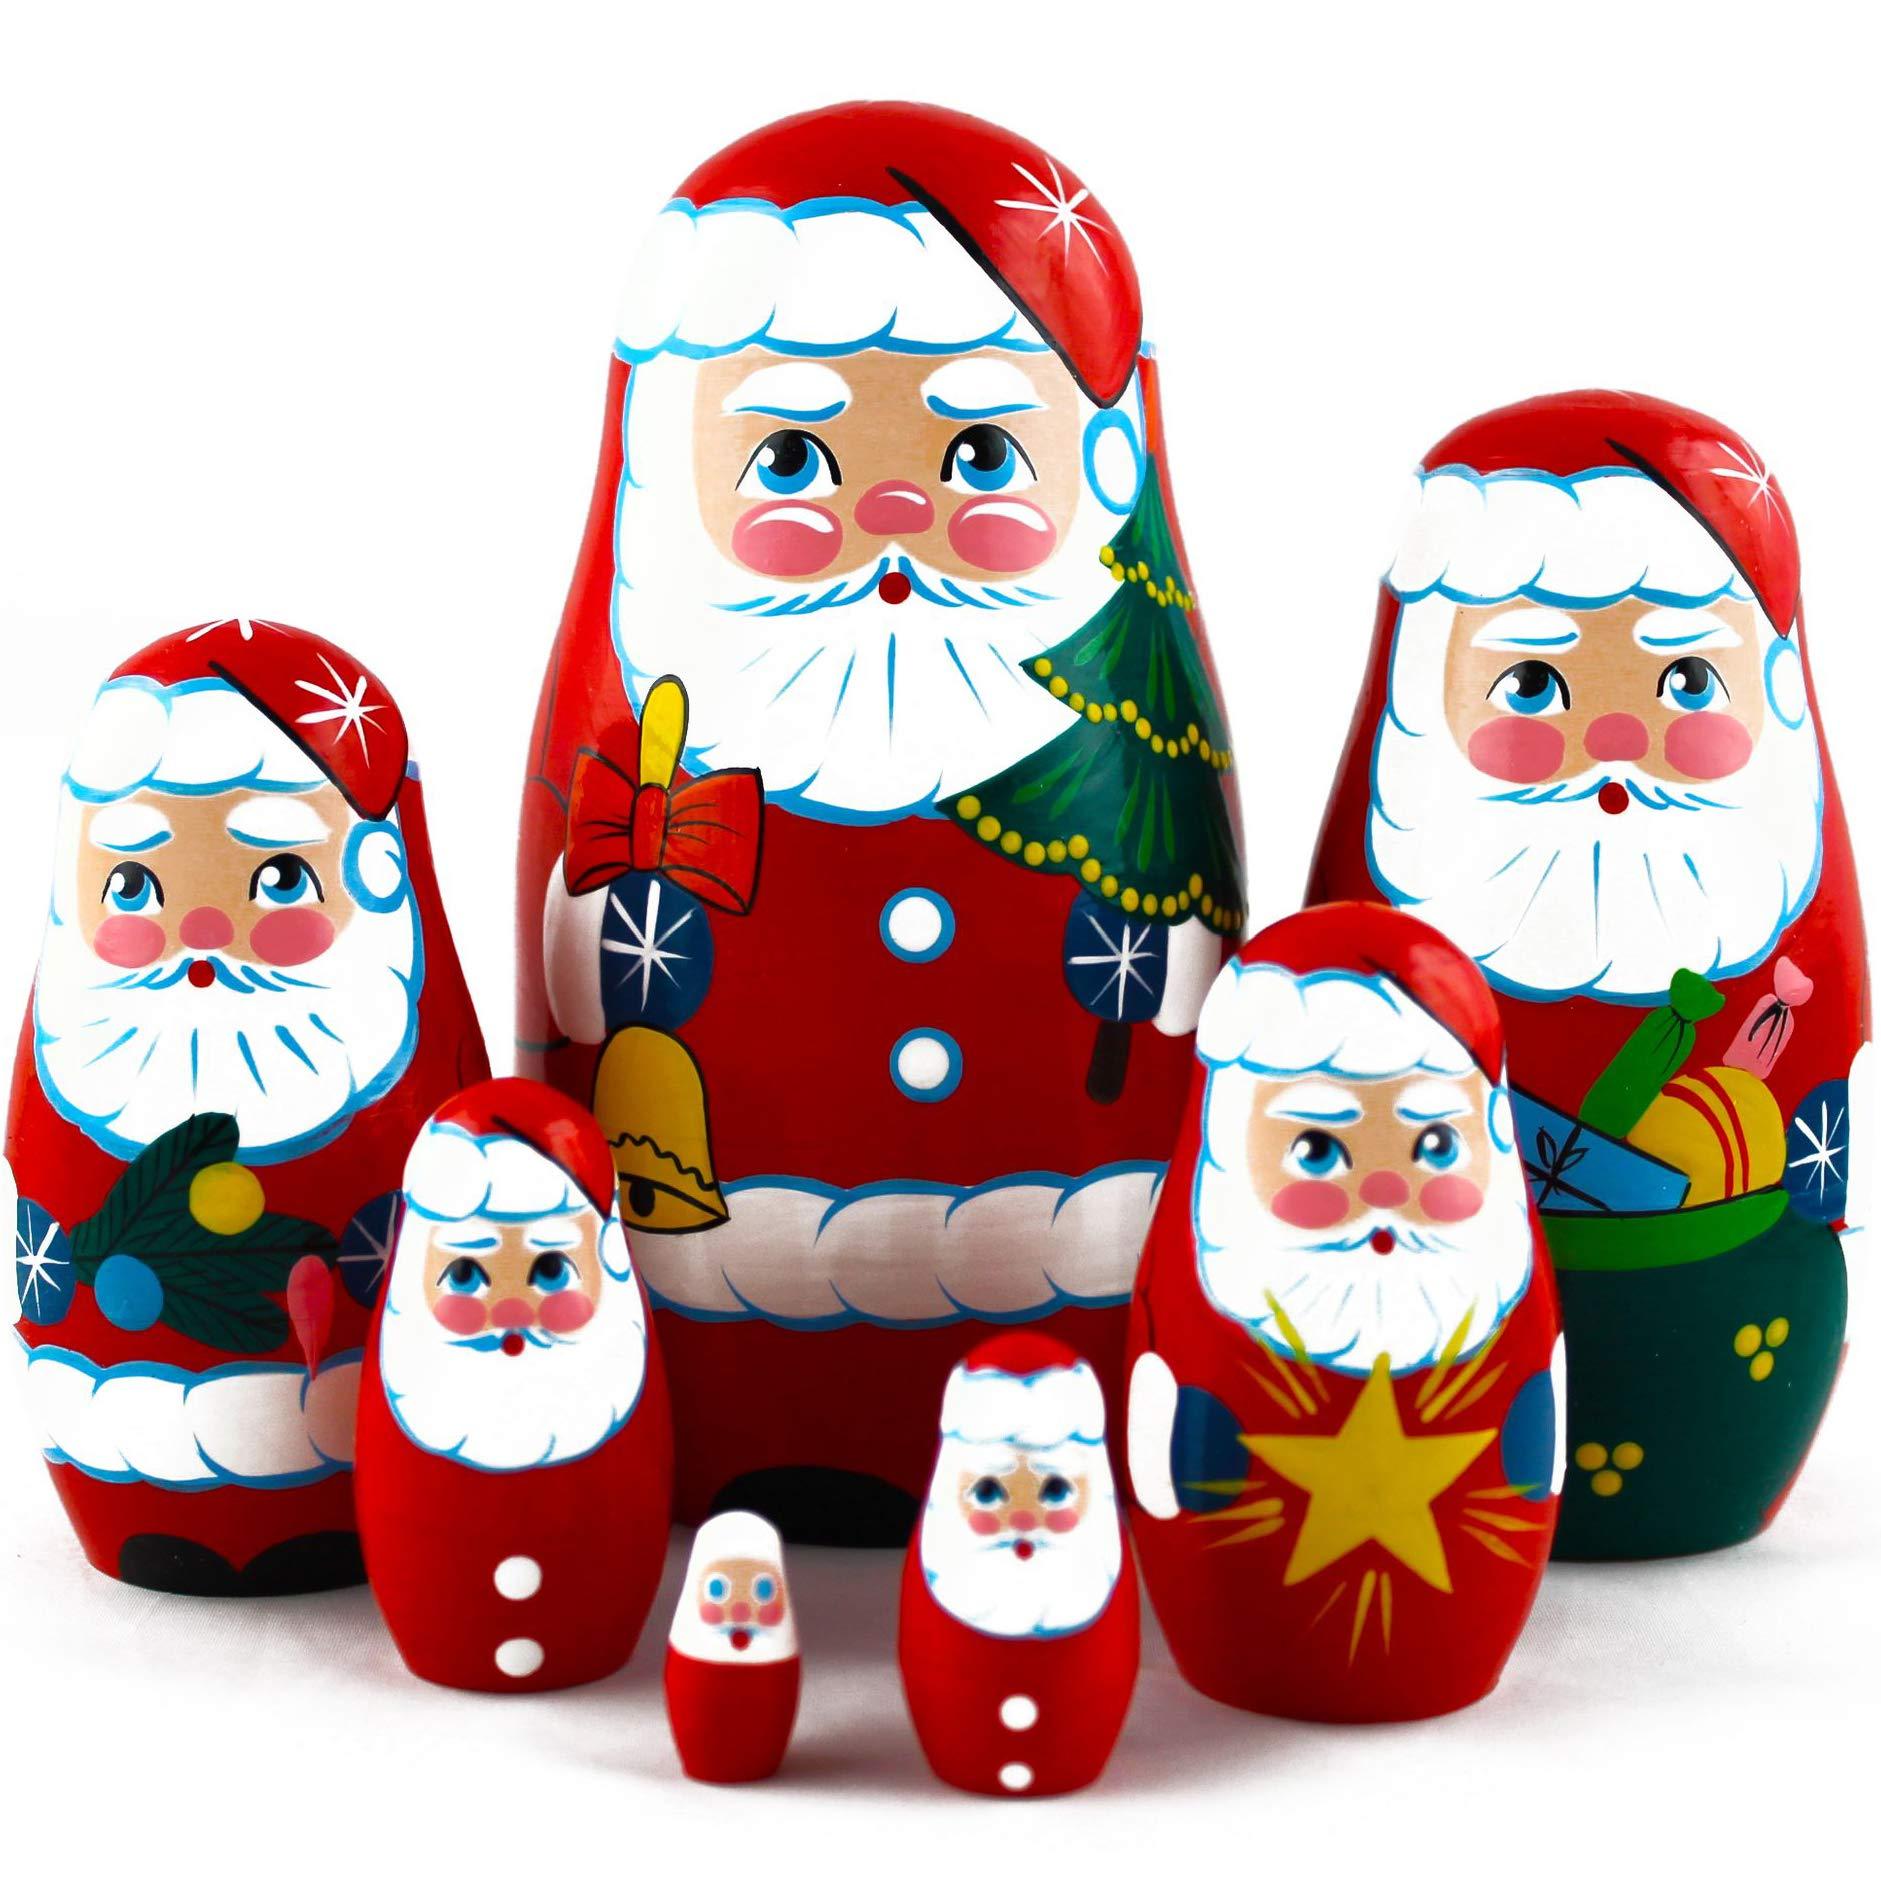 MATRYOSHKA&HANDICRAFT Christmas Santa Nesting Dolls 7 pcs - Santa Claus Christmas Decoration Doll Gifts Ideas by MATRYOSHKA&HANDICRAFT